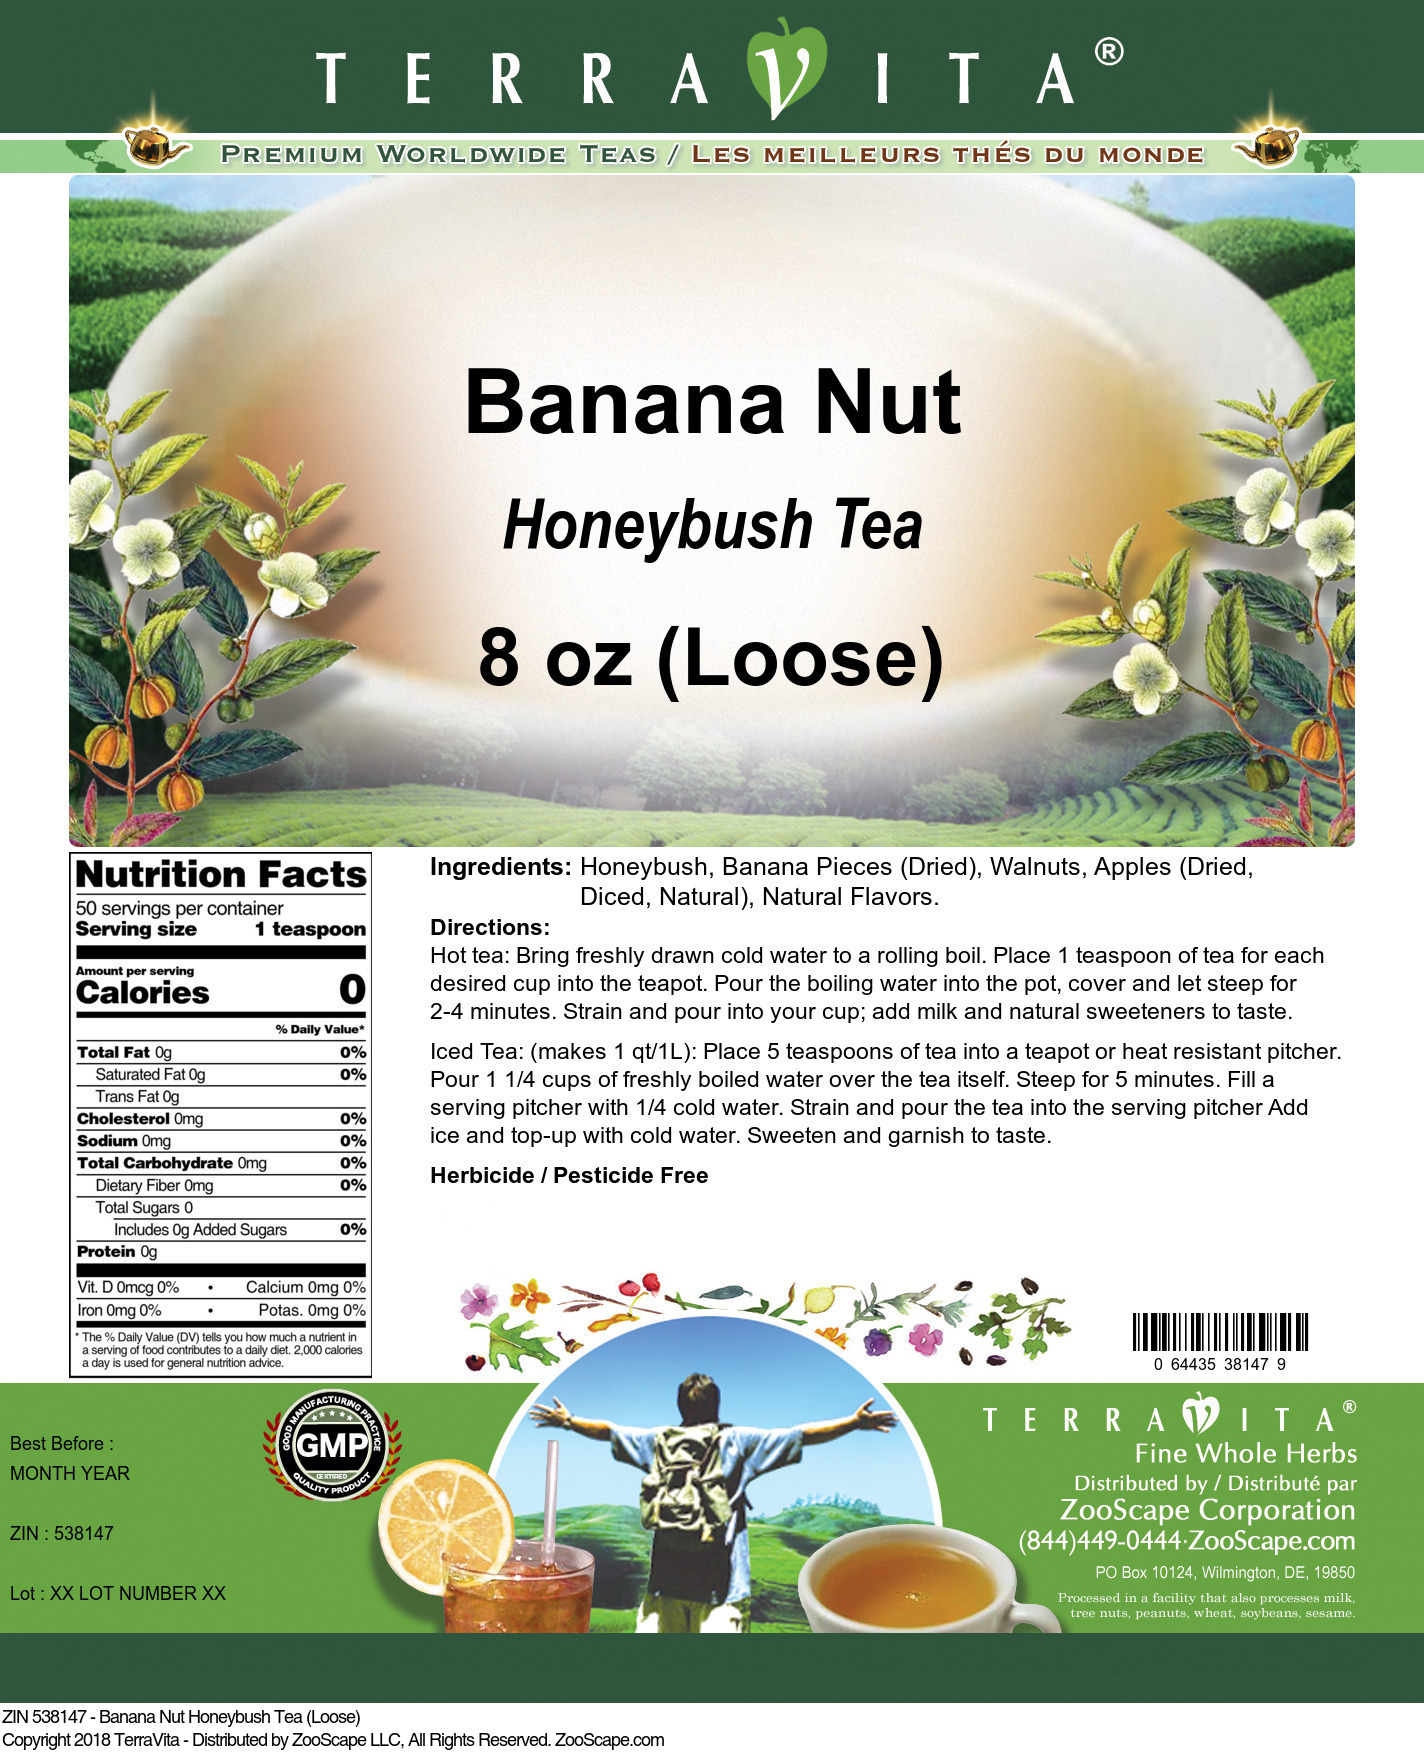 Banana Nut Honeybush Tea (Loose)